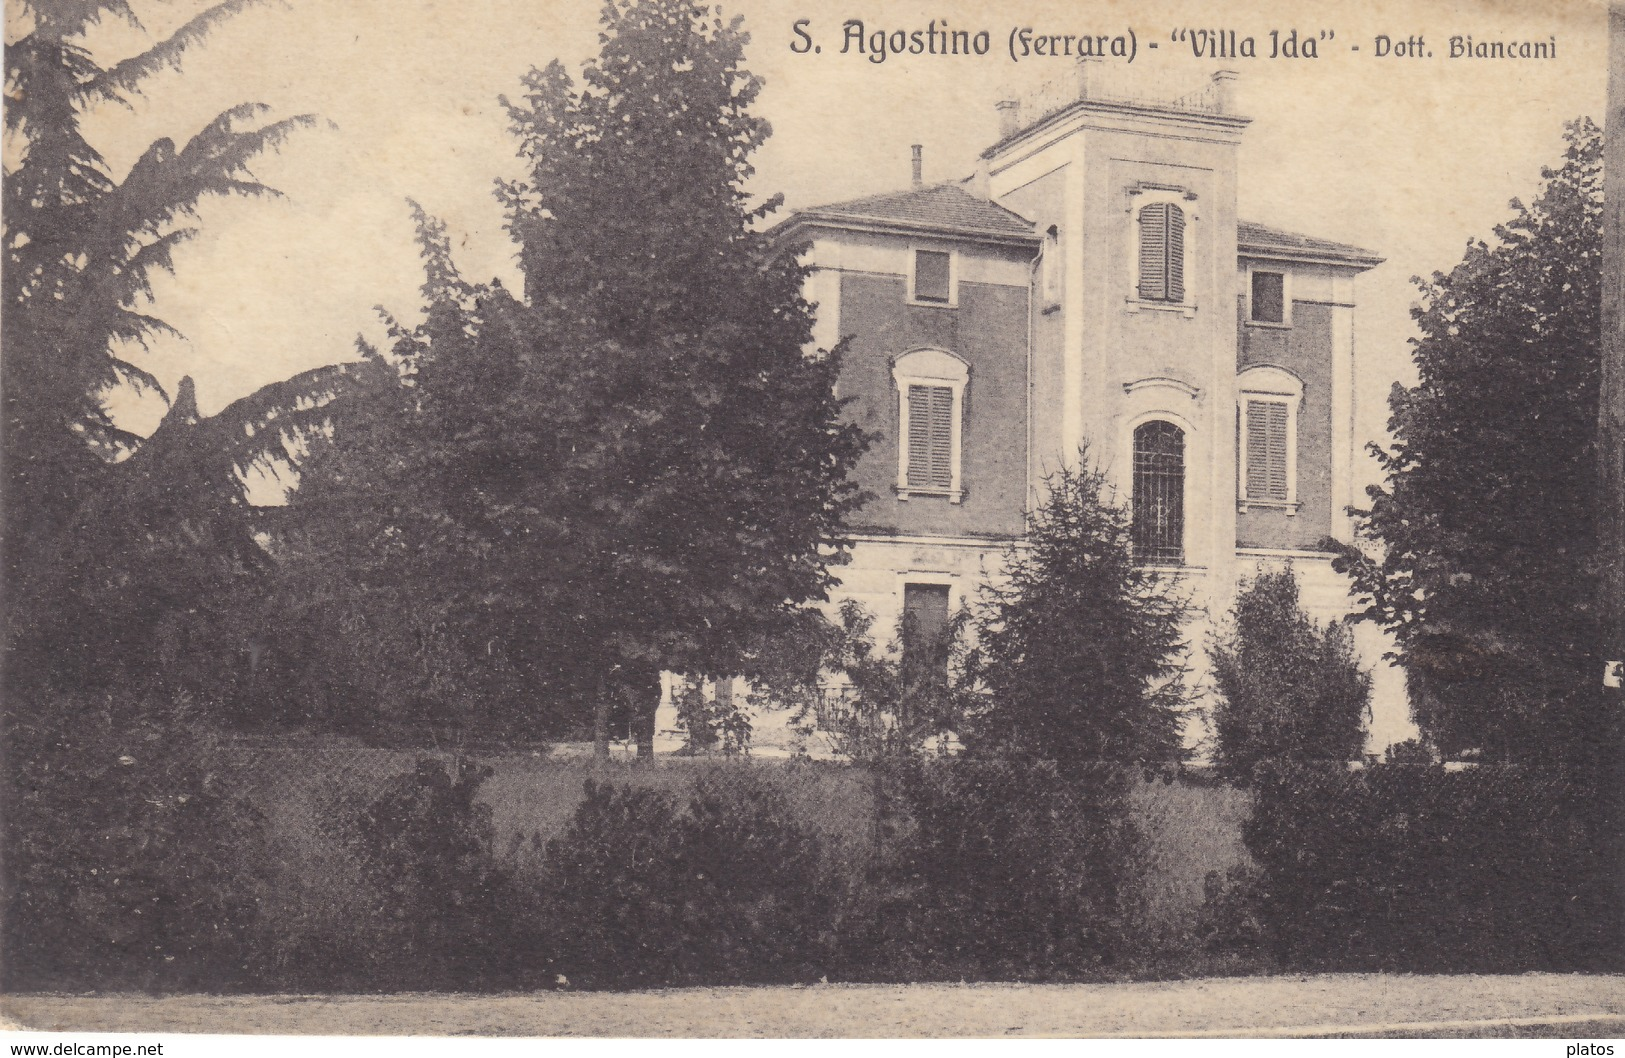 Ferrara - S. Agostino - Villa Ida - Dott. Biancani - Ferrara